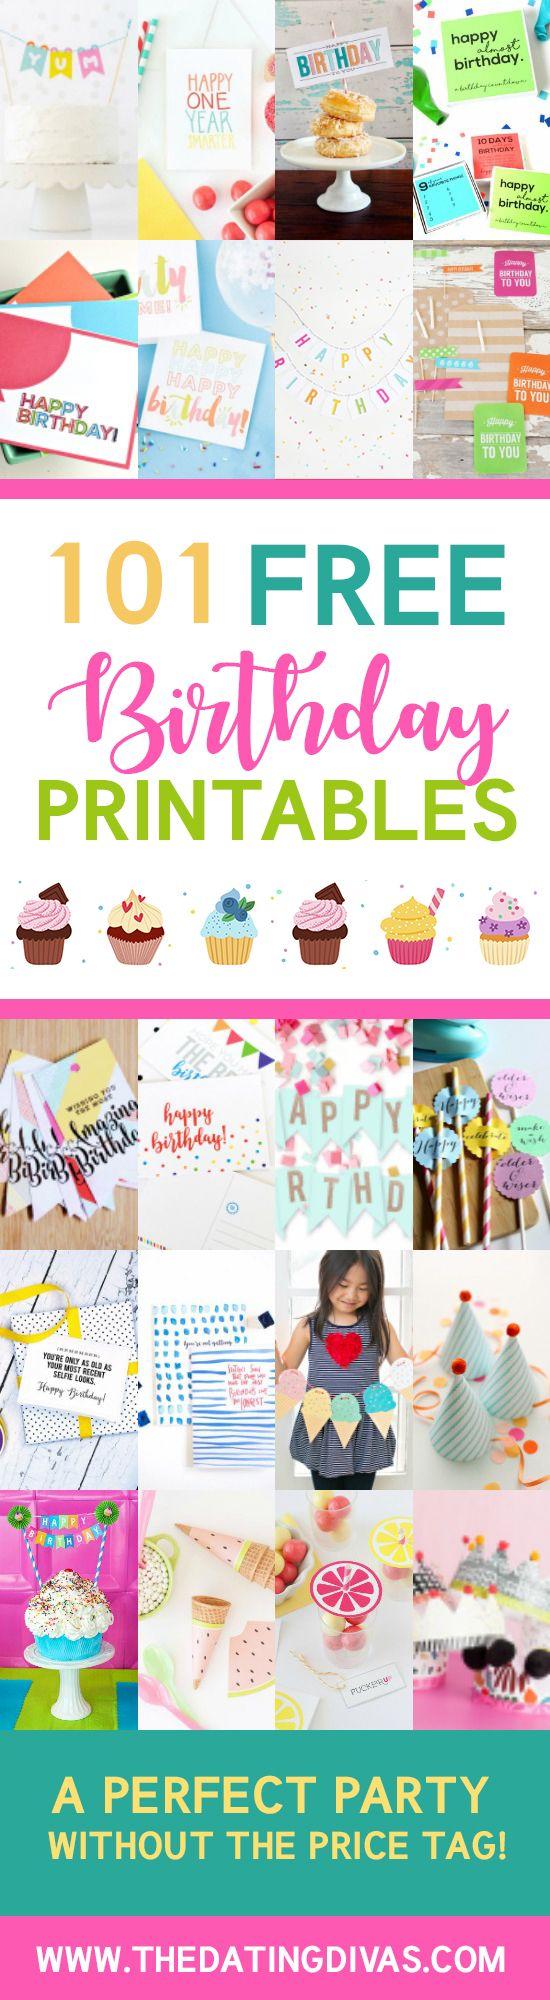 426 Best Birthday Ideas Images On Pinterest Birthday Party Ideas